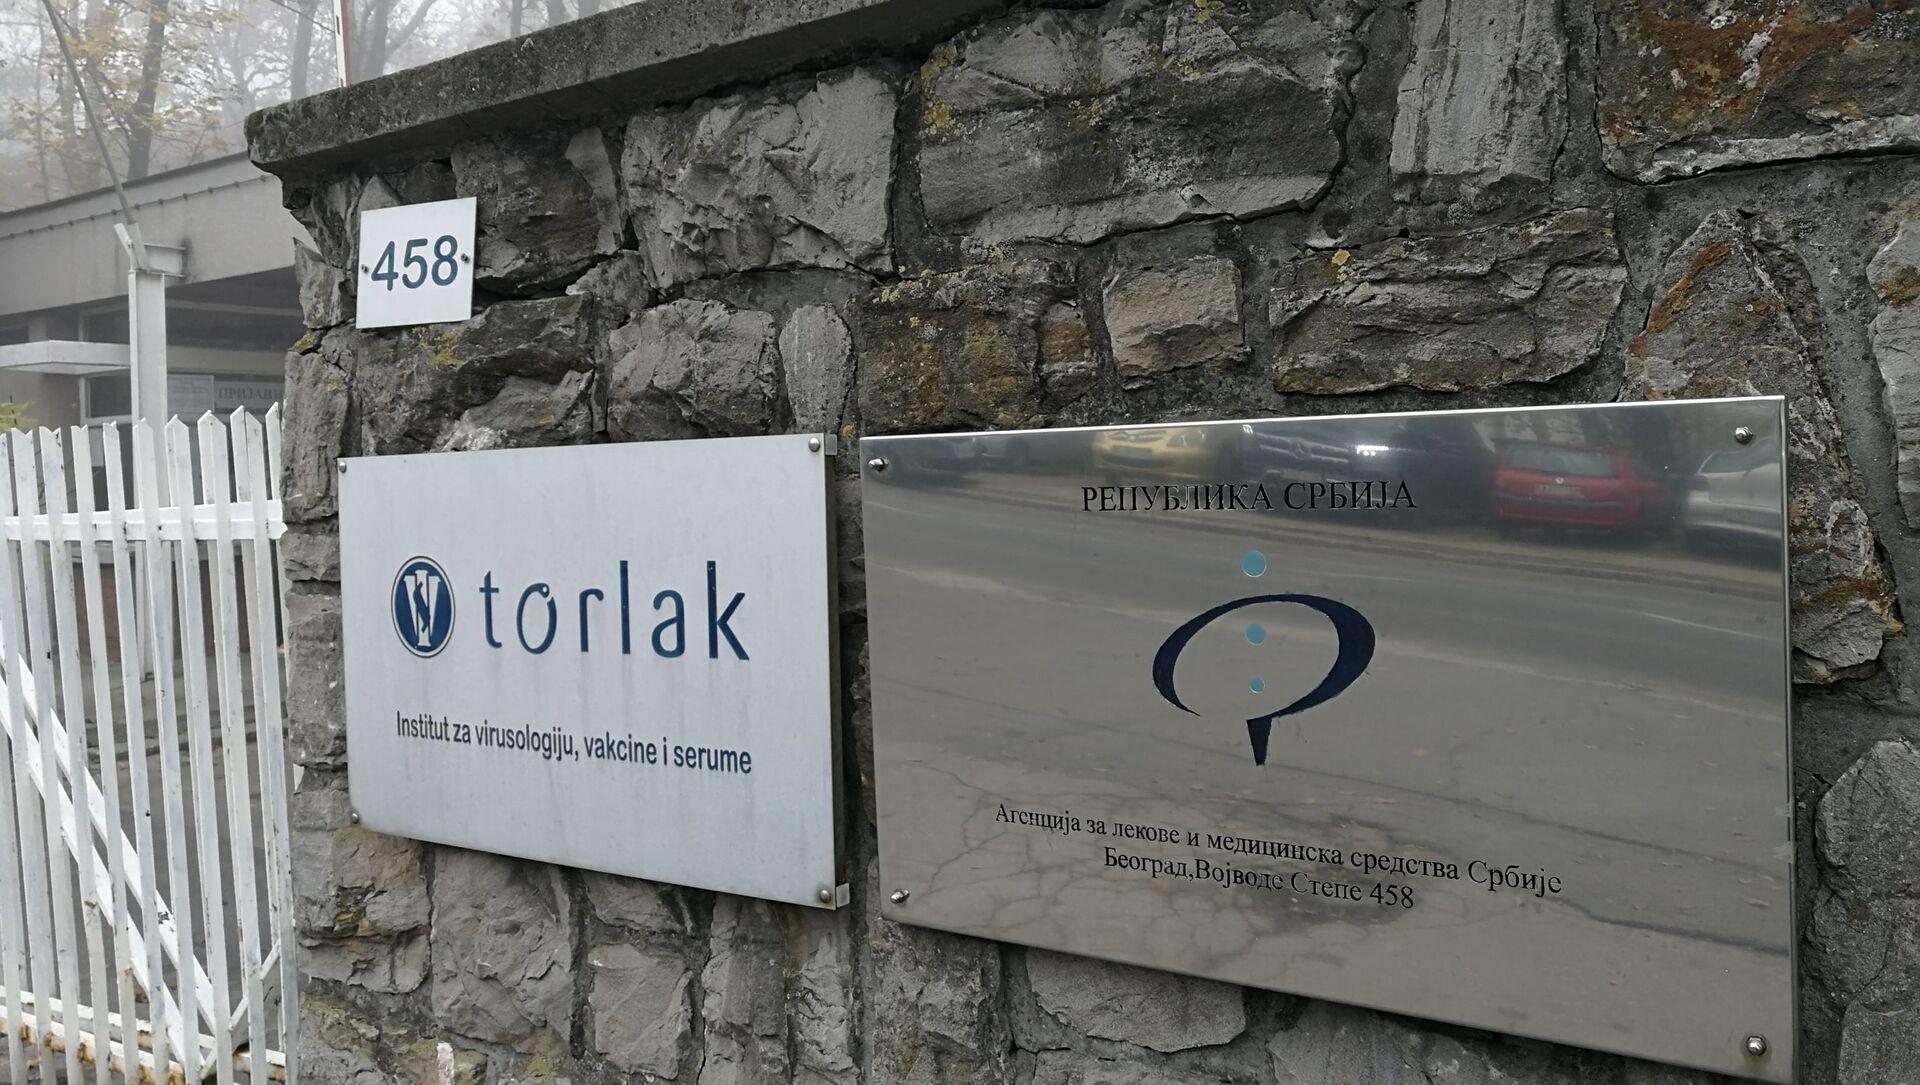 Торлак, табла - Sputnik Србија, 1920, 25.03.2021